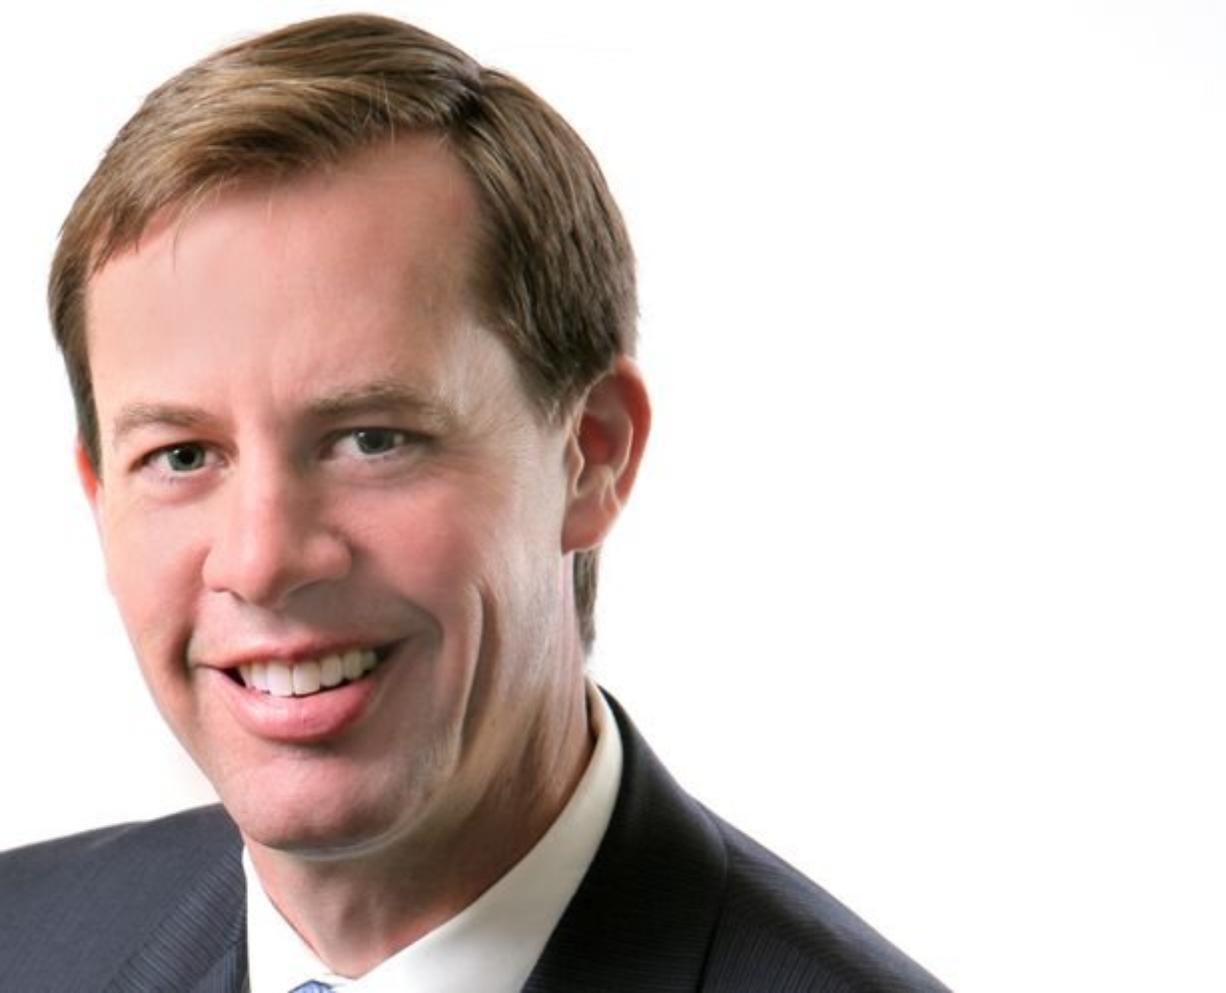 John Nee, vice president of corporate communications, Integra Telecom